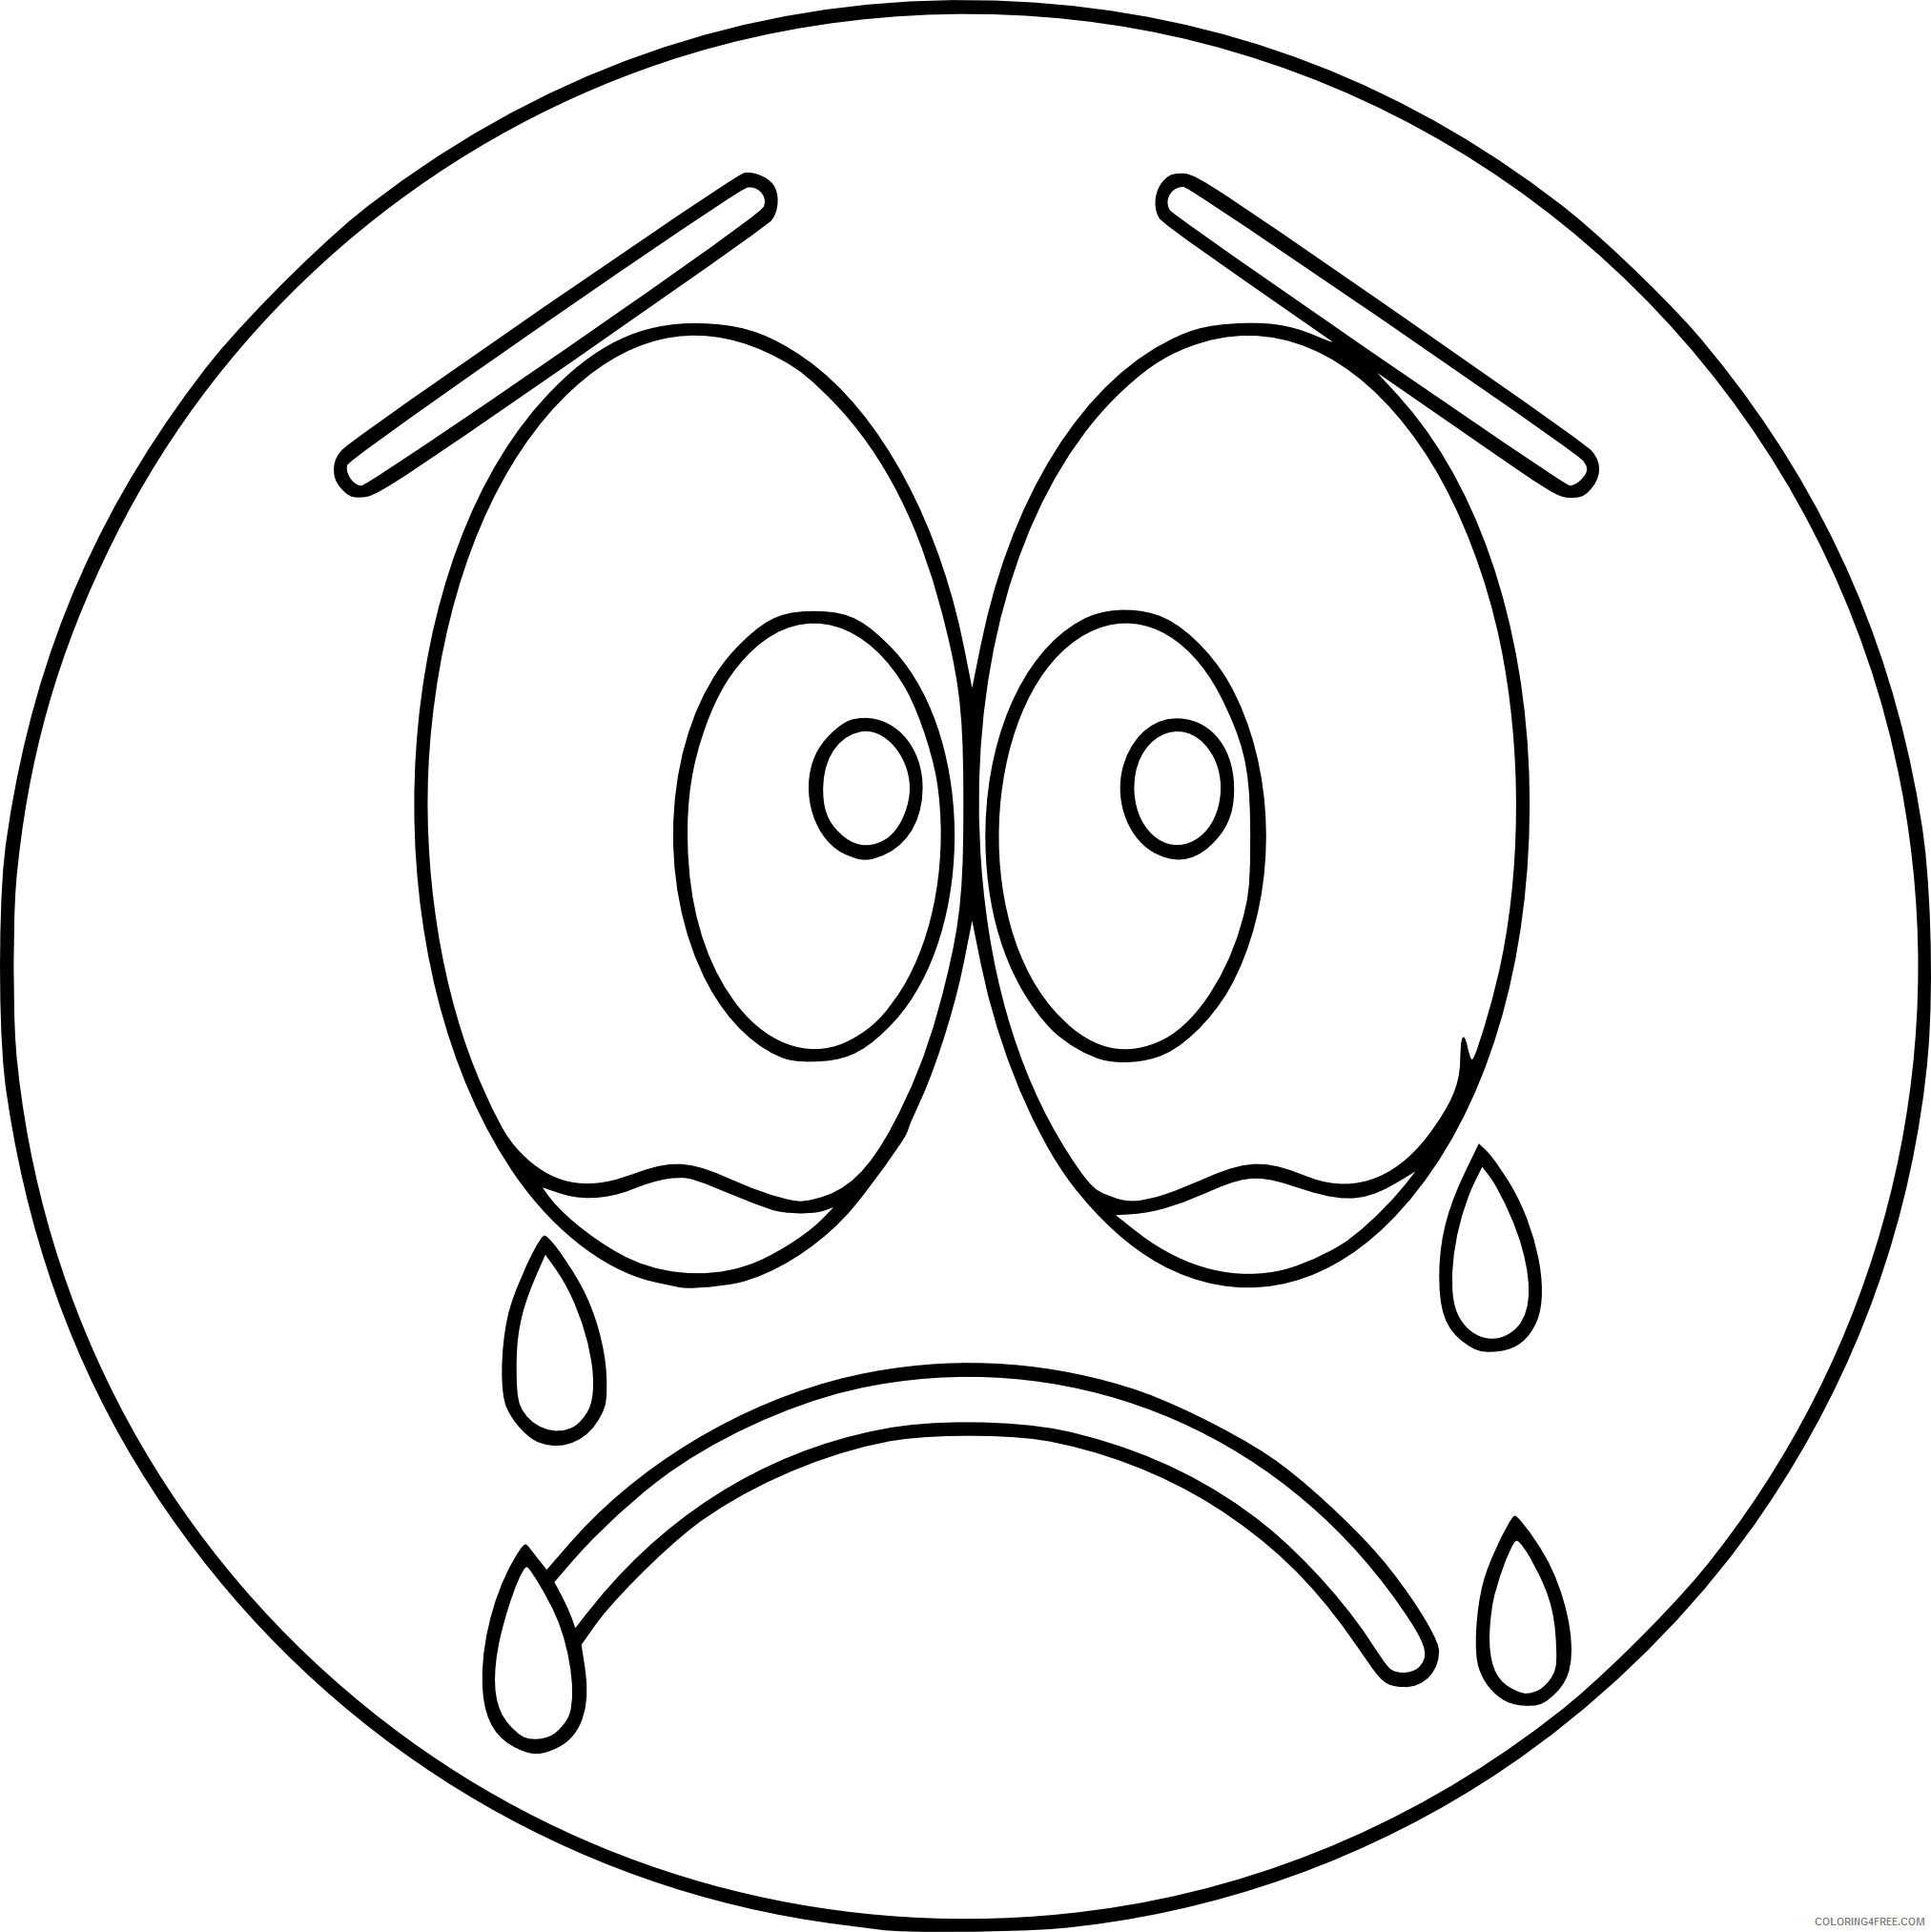 Emoji Coloring Pages Emoji Crying Tears Printable 2021 2184 Coloring4free